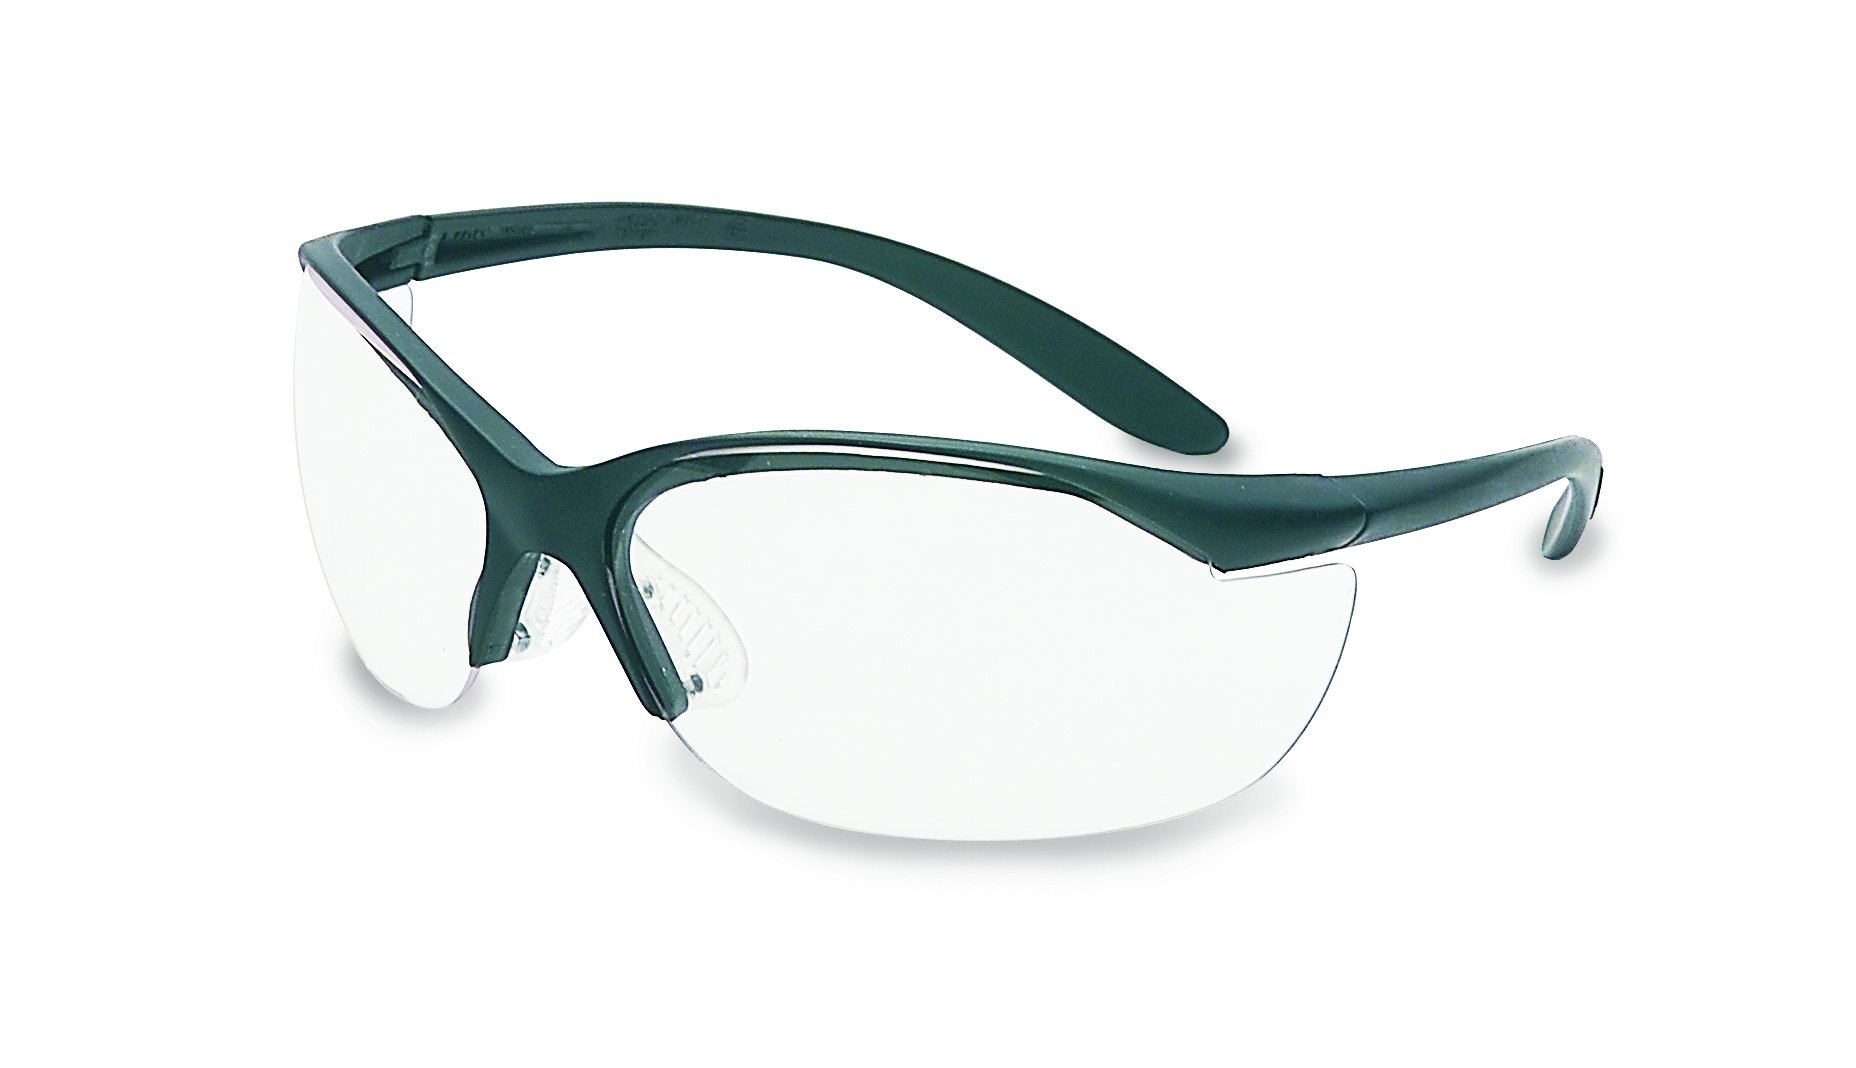 UVEX by Honeywell 11150910 Vapor II Series Safety Eyewear, Black Frame, Clear Lens with Anti-Scratch Hardcoat